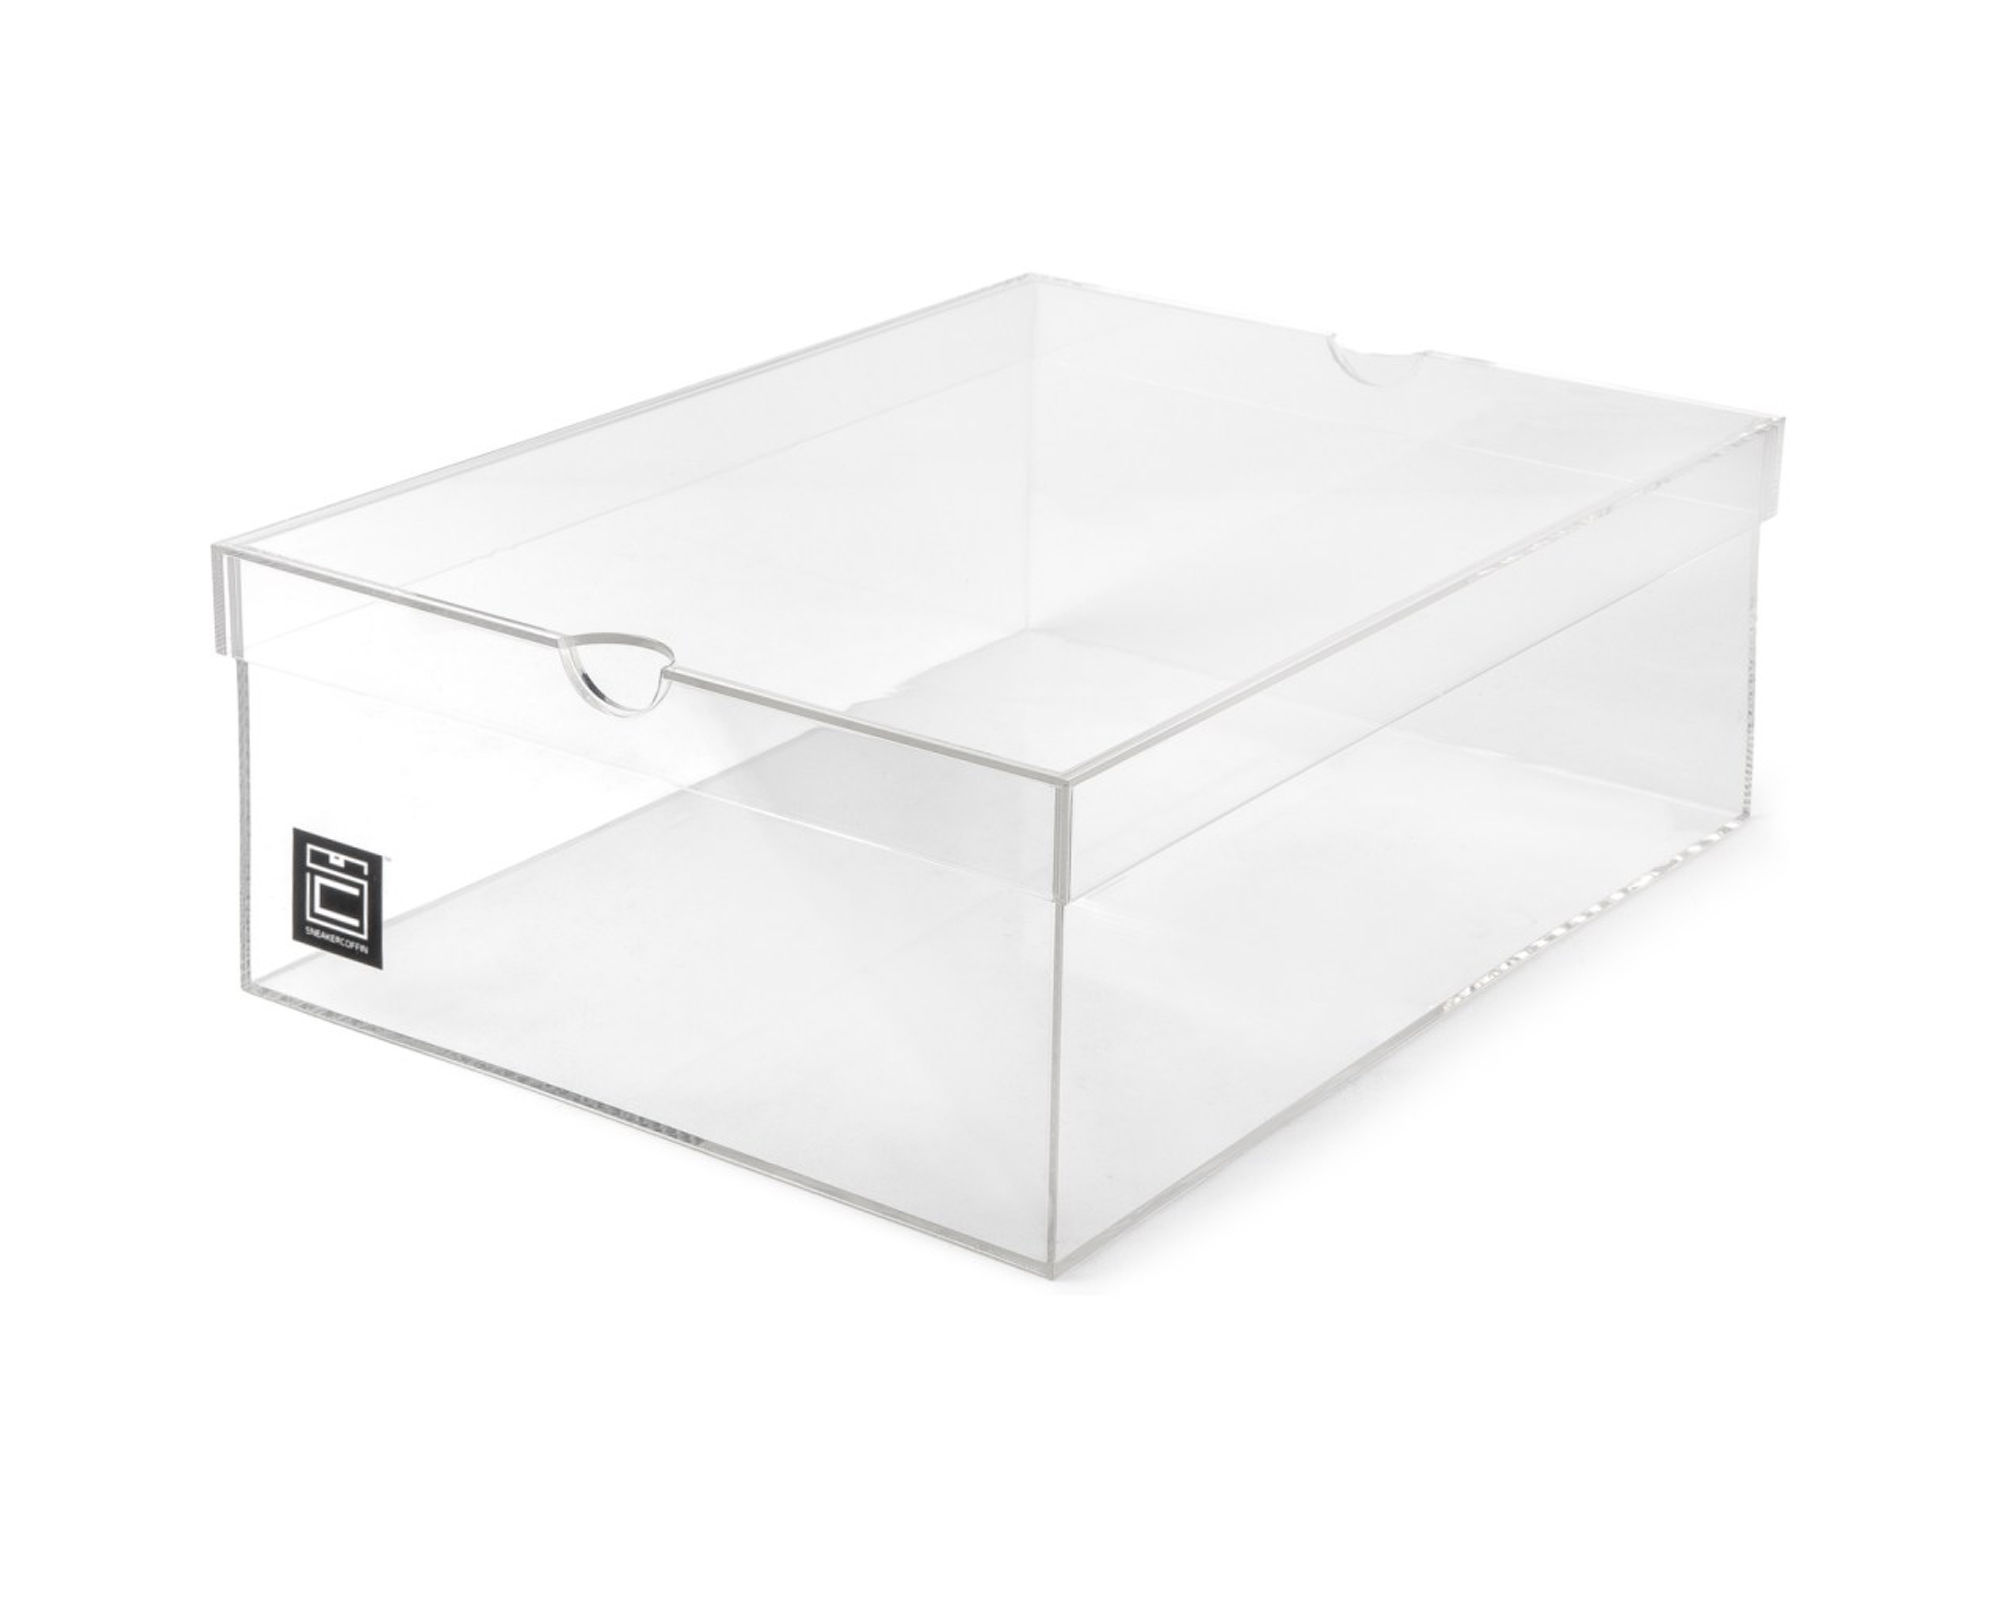 Sneaker Coffin Shoe Box boite à chaussures